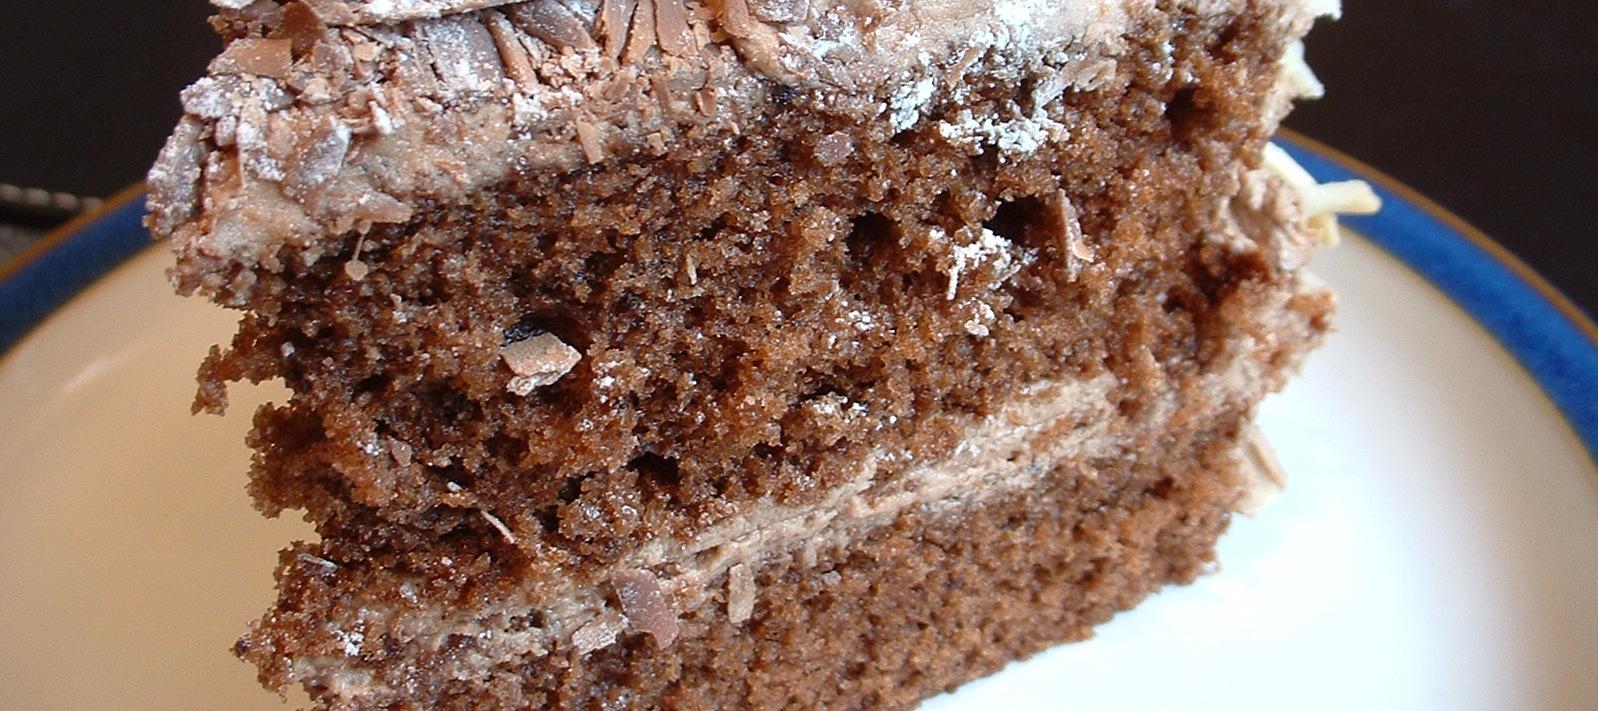 Chocolate cake recipe chocolate sponge cake for Chocolate sponge ingredients